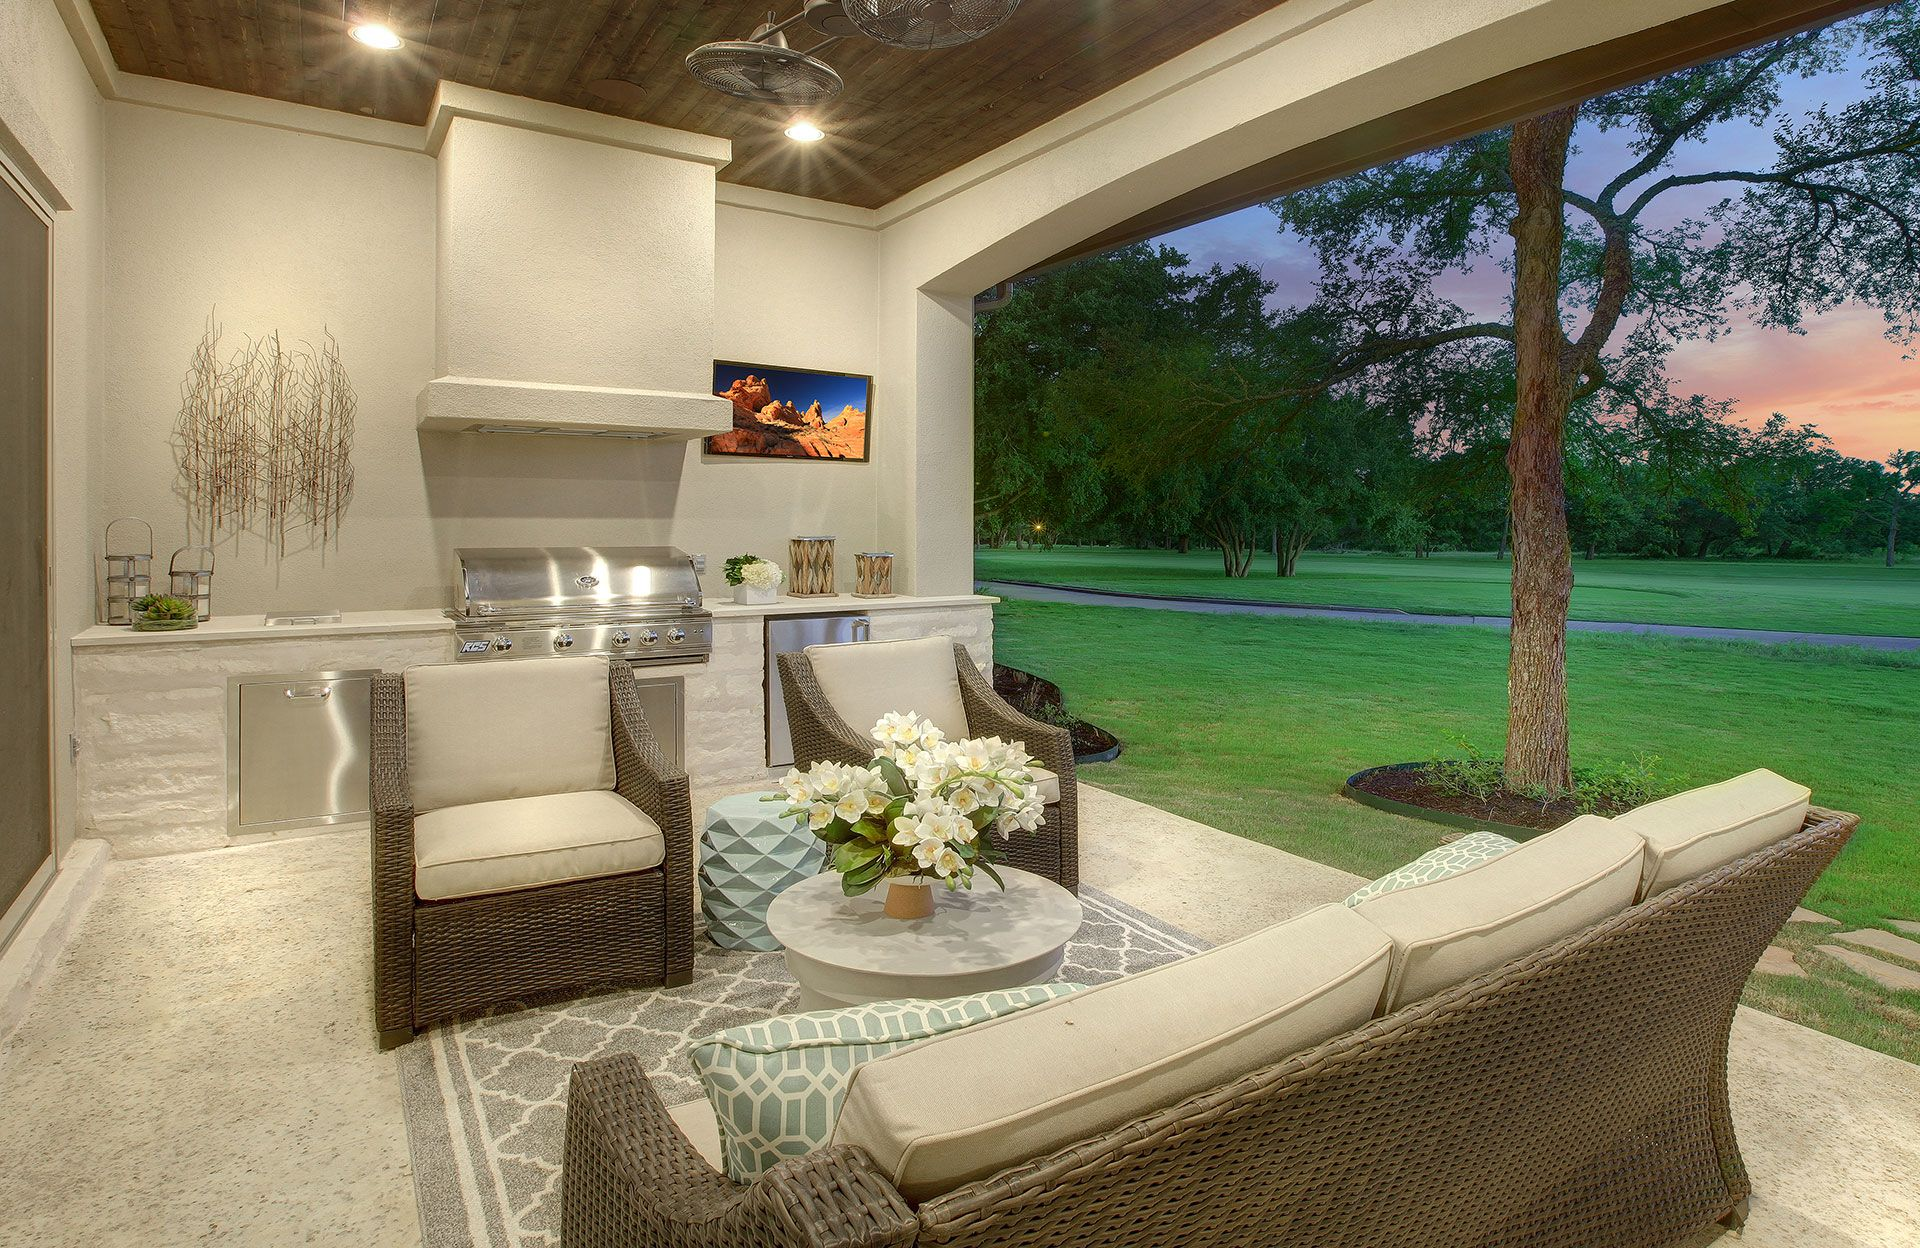 Single Family for Sale at Lauren Ii 313 Flint Ridge Trail Georgetown, Texas 78628 United States